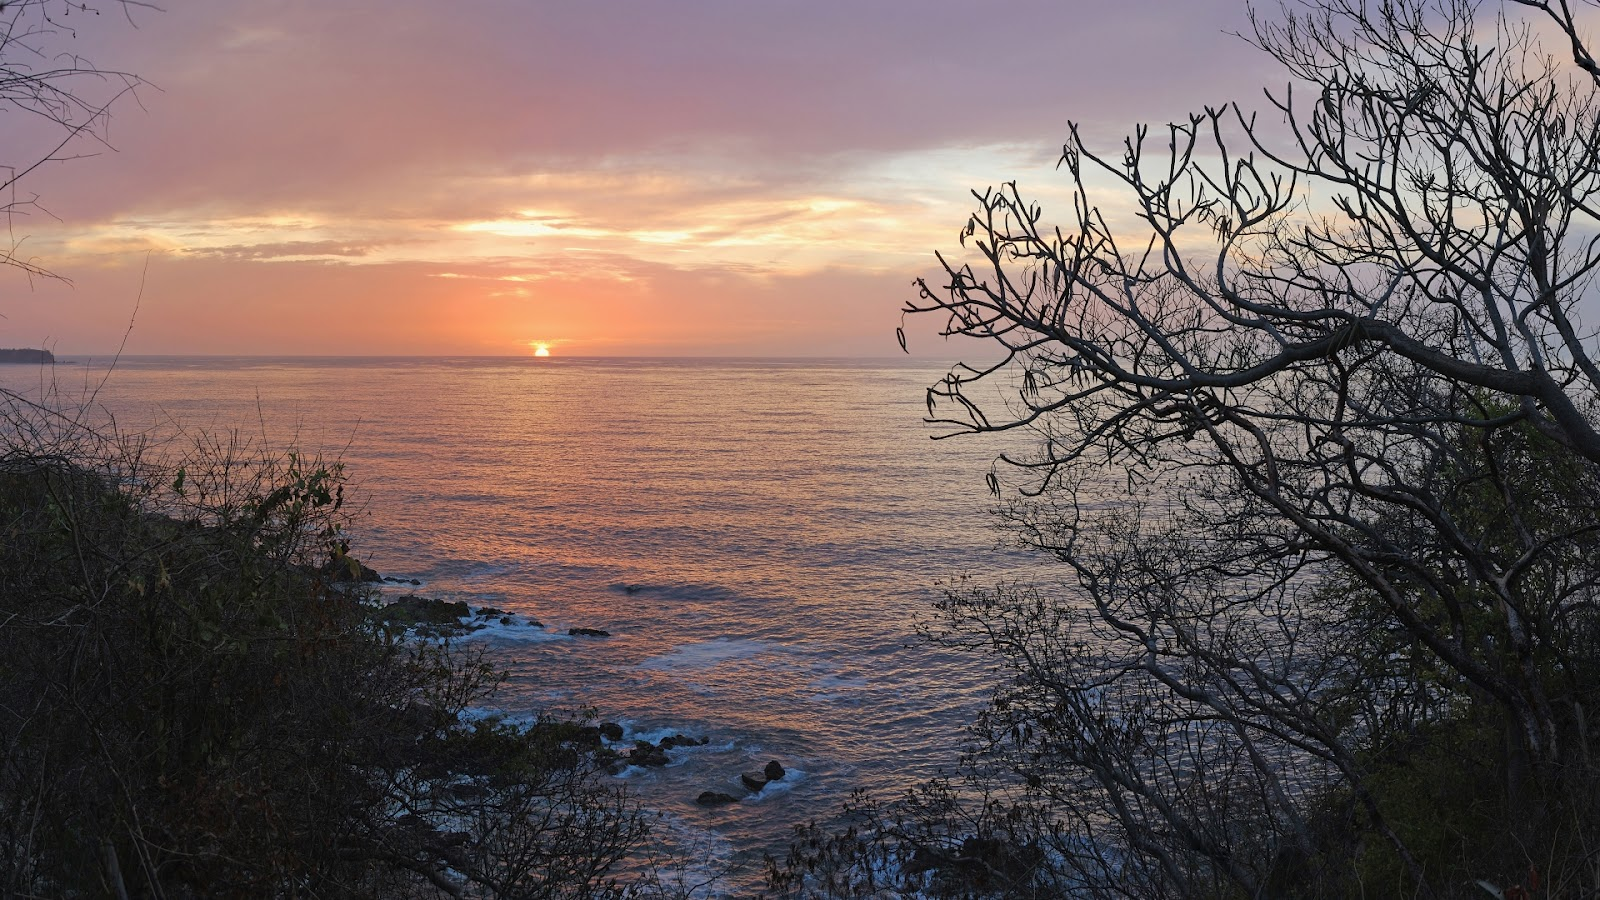 HD Sunset Landscape Wallpapers